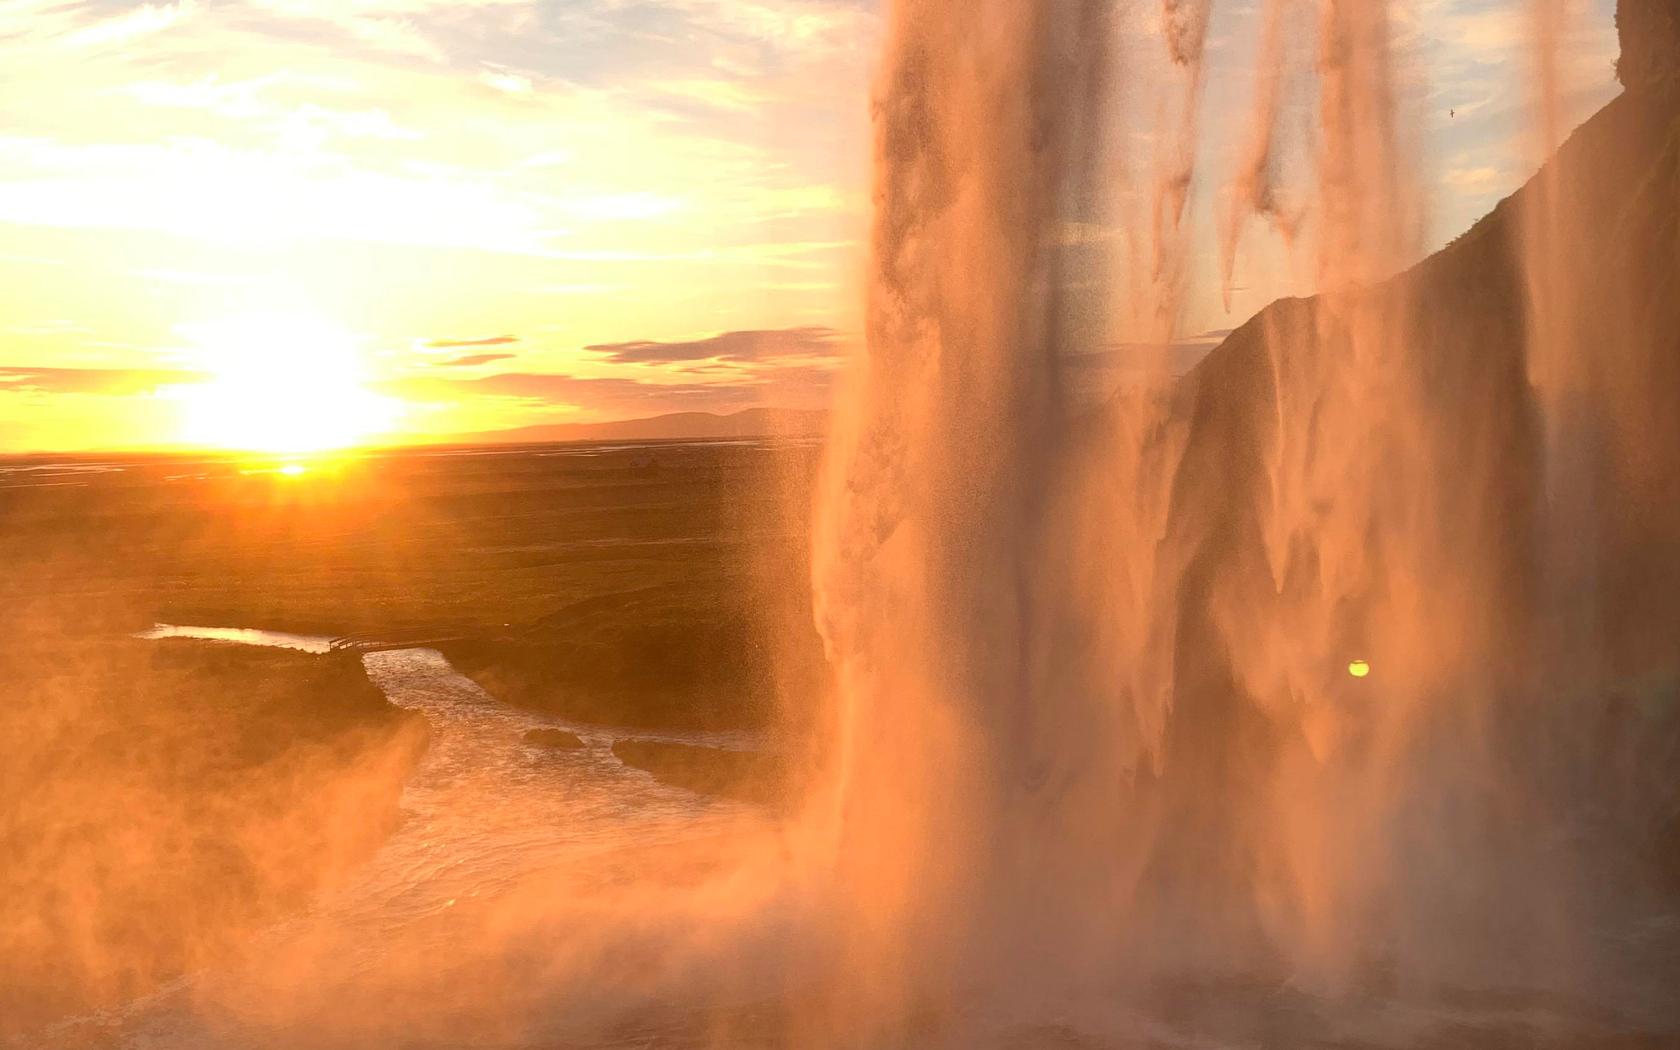 sunset-from-waterfall-behind-zj.jpg